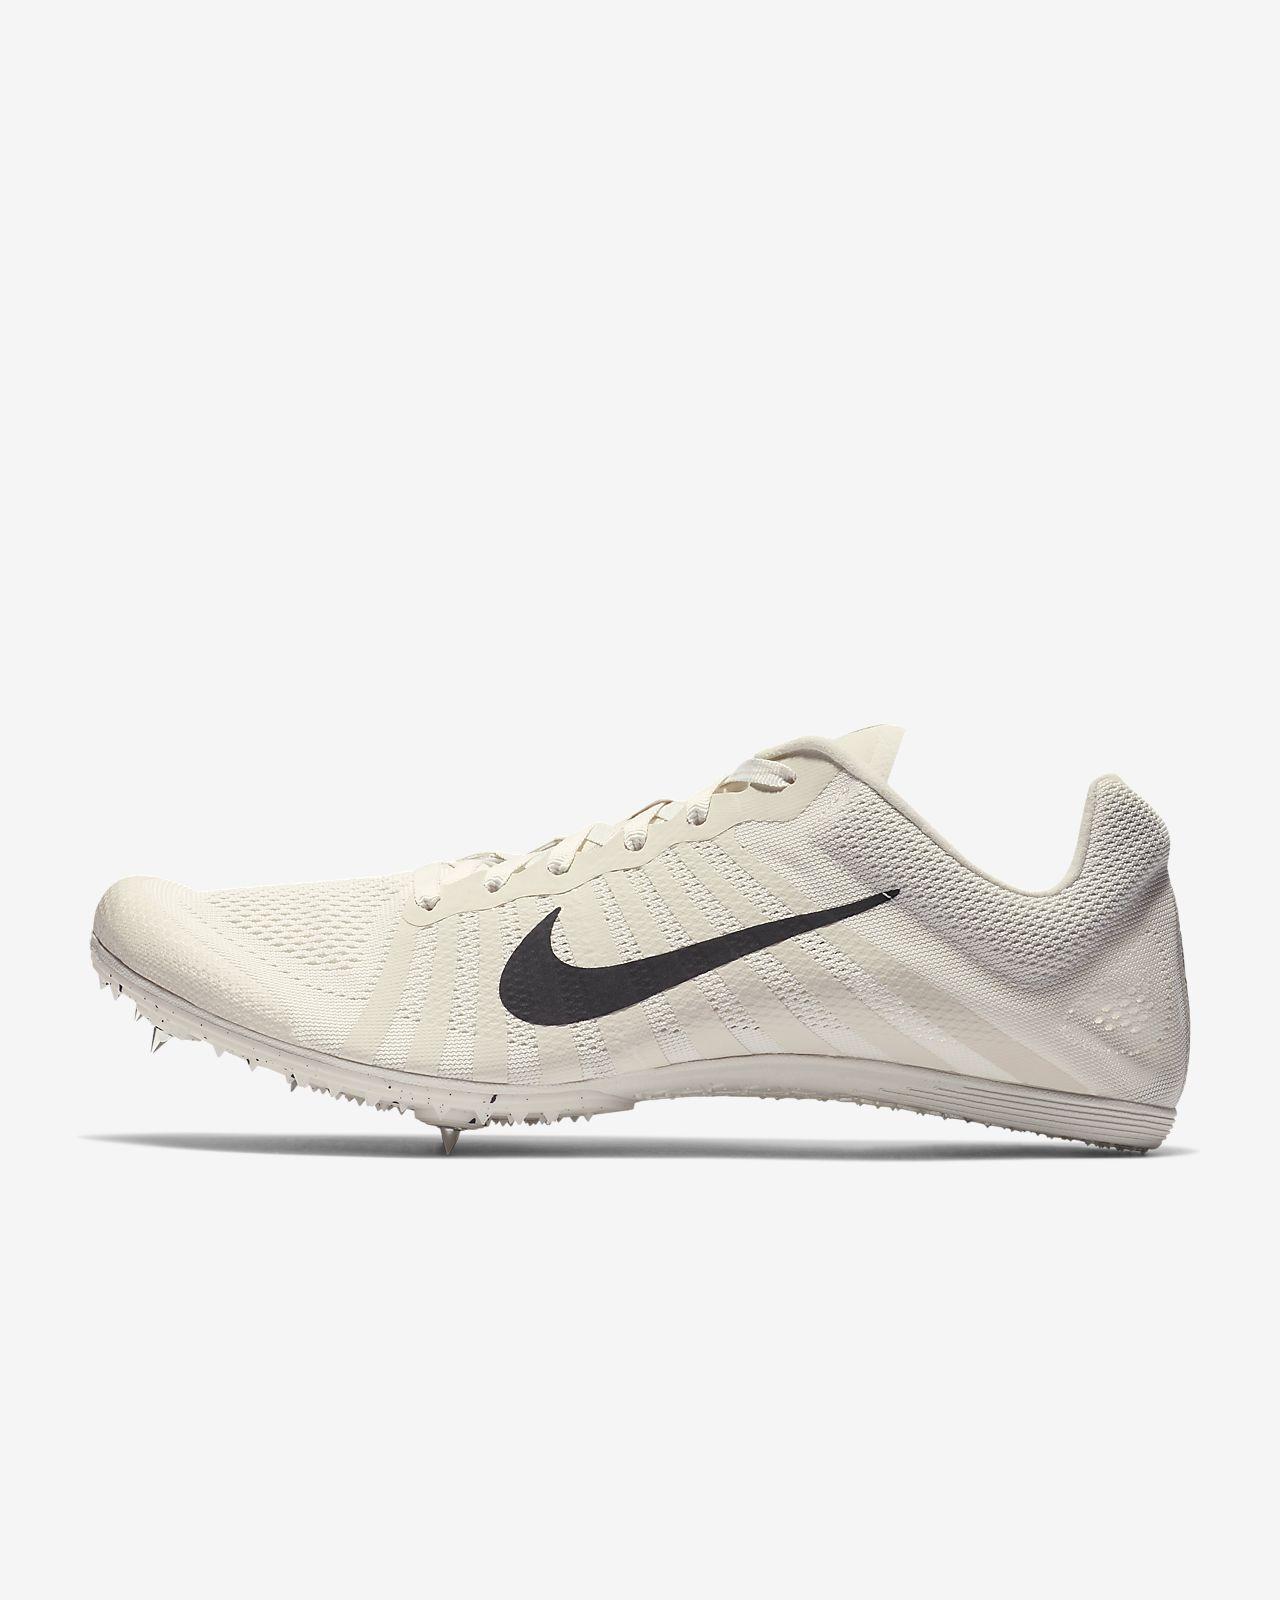 Unisex παπούτσι στίβου Nike Zoom D Distance